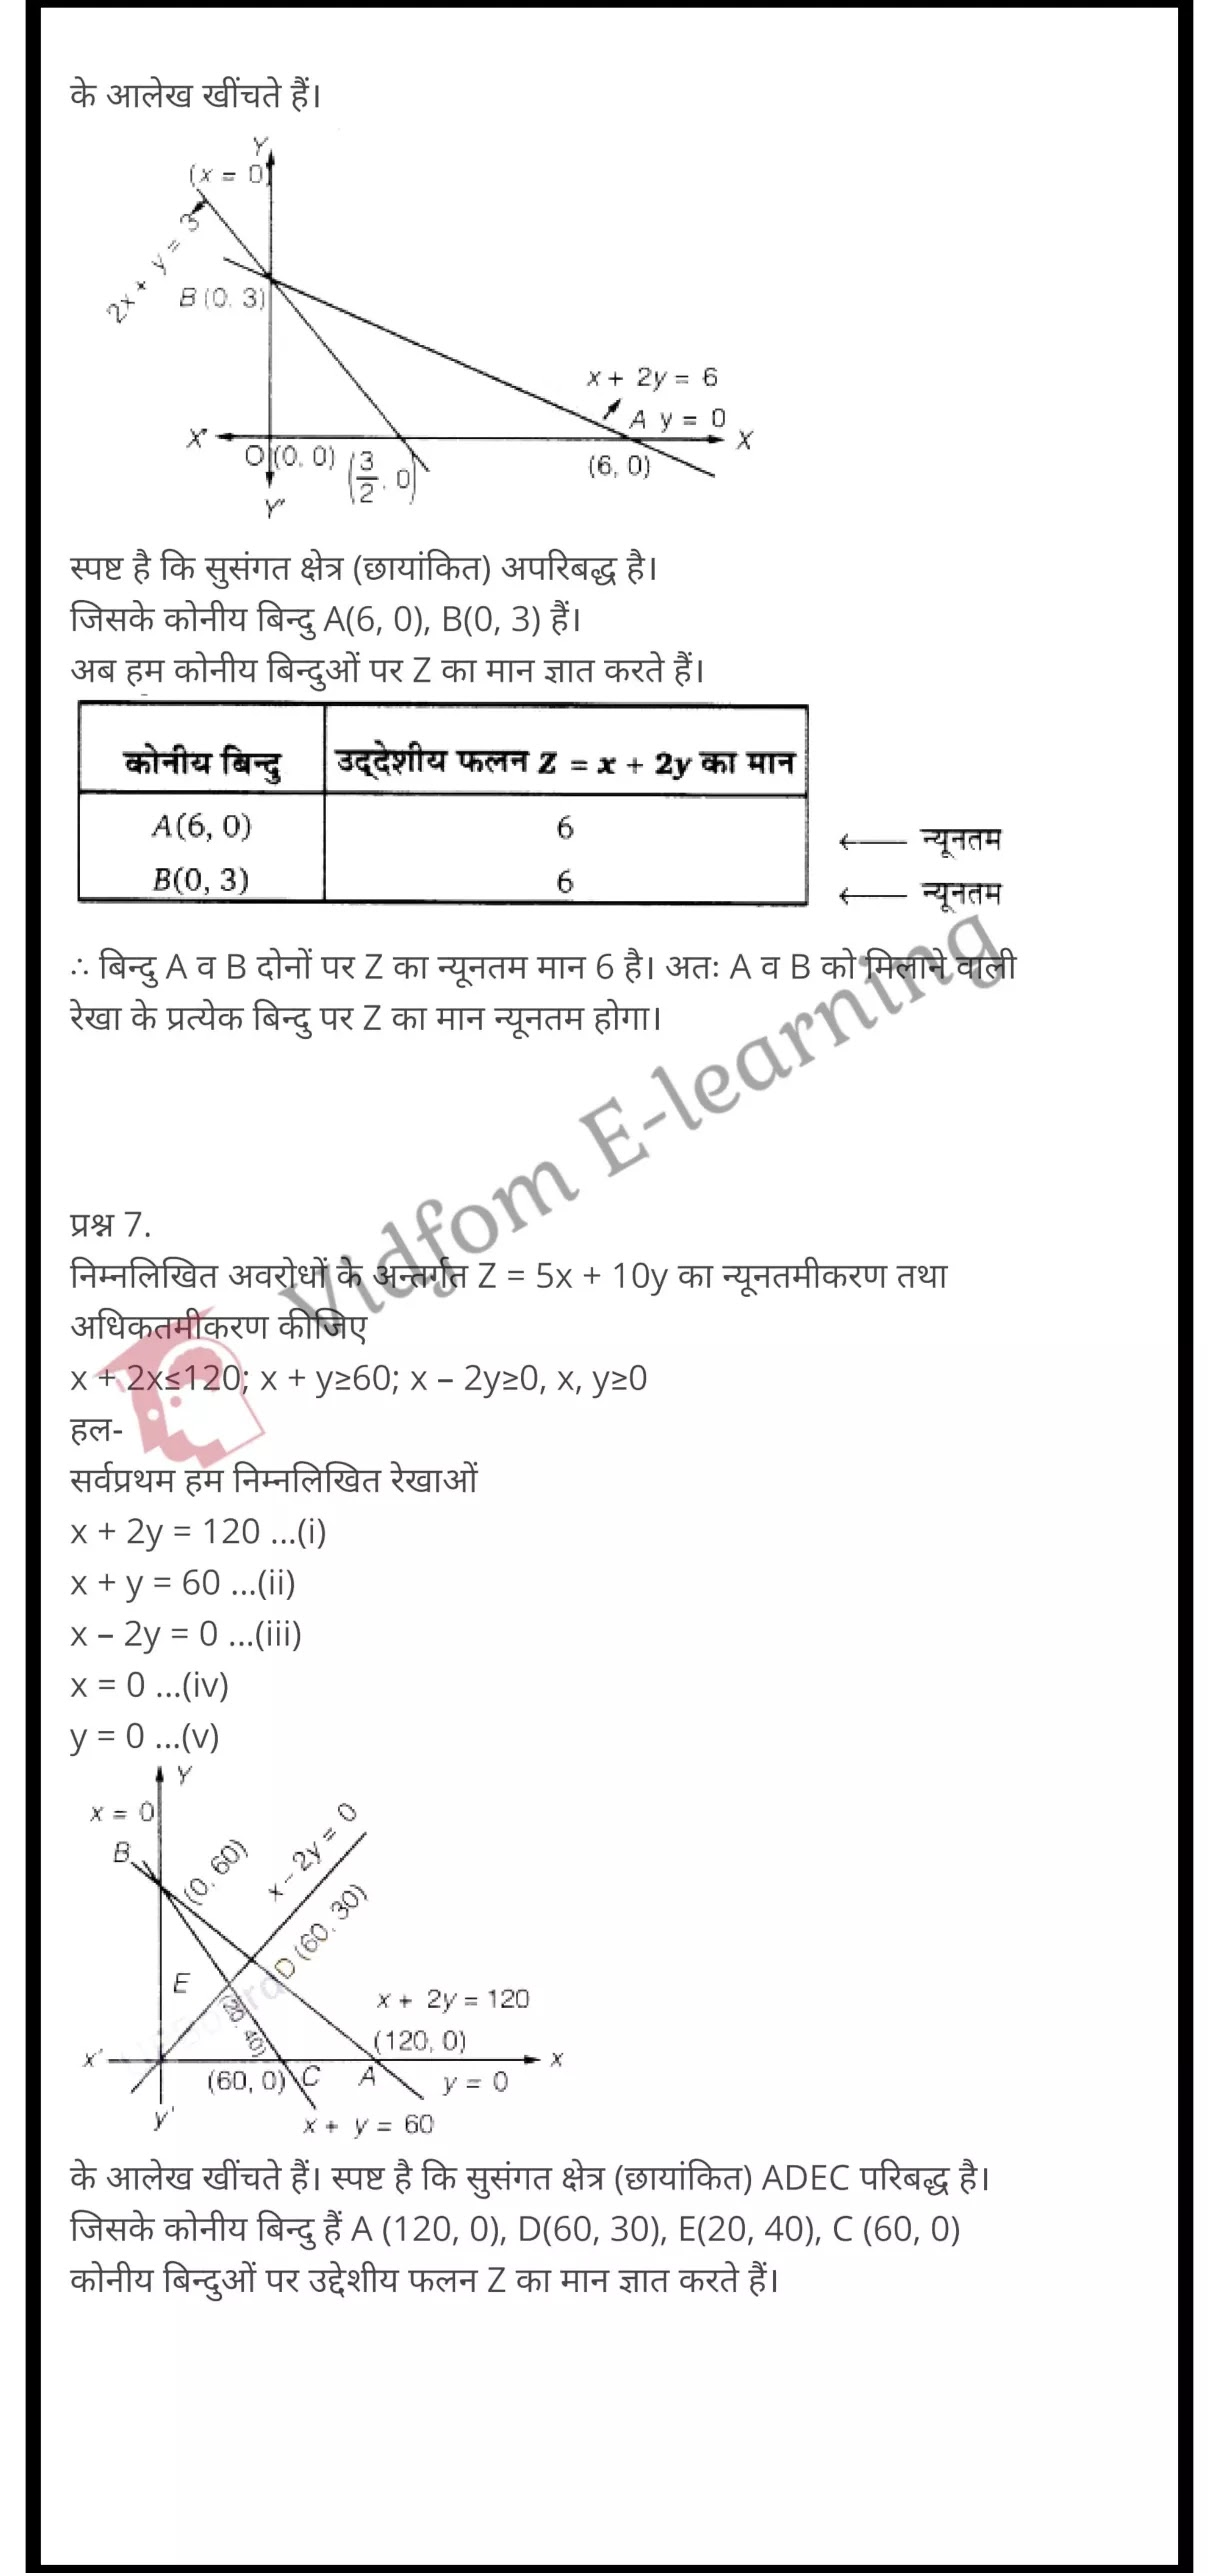 कक्षा 12 गणित  के नोट्स  हिंदी में एनसीईआरटी समाधान,     class 12 Maths Chapter 12,   class 12 Maths Chapter 12 ncert solutions in Hindi,   class 12 Maths Chapter 12 notes in hindi,   class 12 Maths Chapter 12 question answer,   class 12 Maths Chapter 12 notes,   class 12 Maths Chapter 12 class 12 Maths Chapter 12 in  hindi,    class 12 Maths Chapter 12 important questions in  hindi,   class 12 Maths Chapter 12 notes in hindi,    class 12 Maths Chapter 12 test,   class 12 Maths Chapter 12 pdf,   class 12 Maths Chapter 12 notes pdf,   class 12 Maths Chapter 12 exercise solutions,   class 12 Maths Chapter 12 notes study rankers,   class 12 Maths Chapter 12 notes,    class 12 Maths Chapter 12  class 12  notes pdf,   class 12 Maths Chapter 12 class 12  notes  ncert,   class 12 Maths Chapter 12 class 12 pdf,   class 12 Maths Chapter 12  book,   class 12 Maths Chapter 12 quiz class 12  ,    12  th class 12 Maths Chapter 12  book up board,   up board 12  th class 12 Maths Chapter 12 notes,  class 12 Maths,   class 12 Maths ncert solutions in Hindi,   class 12 Maths notes in hindi,   class 12 Maths question answer,   class 12 Maths notes,  class 12 Maths class 12 Maths Chapter 12 in  hindi,    class 12 Maths important questions in  hindi,   class 12 Maths notes in hindi,    class 12 Maths test,  class 12 Maths class 12 Maths Chapter 12 pdf,   class 12 Maths notes pdf,   class 12 Maths exercise solutions,   class 12 Maths,  class 12 Maths notes study rankers,   class 12 Maths notes,  class 12 Maths notes,   class 12 Maths  class 12  notes pdf,   class 12 Maths class 12  notes  ncert,   class 12 Maths class 12 pdf,   class 12 Maths  book,  class 12 Maths quiz class 12  ,  12  th class 12 Maths    book up board,    up board 12  th class 12 Maths notes,      कक्षा 12 गणित अध्याय 12 ,  कक्षा 12 गणित, कक्षा 12 गणित अध्याय 12  के नोट्स हिंदी में,  कक्षा 12 का हिंदी अध्याय 12 का प्रश्न उत्तर,  कक्षा 12 गणित अध्याय 12 के नोट्स,  12 कक्षा गणित  हिंदी में, कक्षा 12 गणित अध्याय 12  हिं